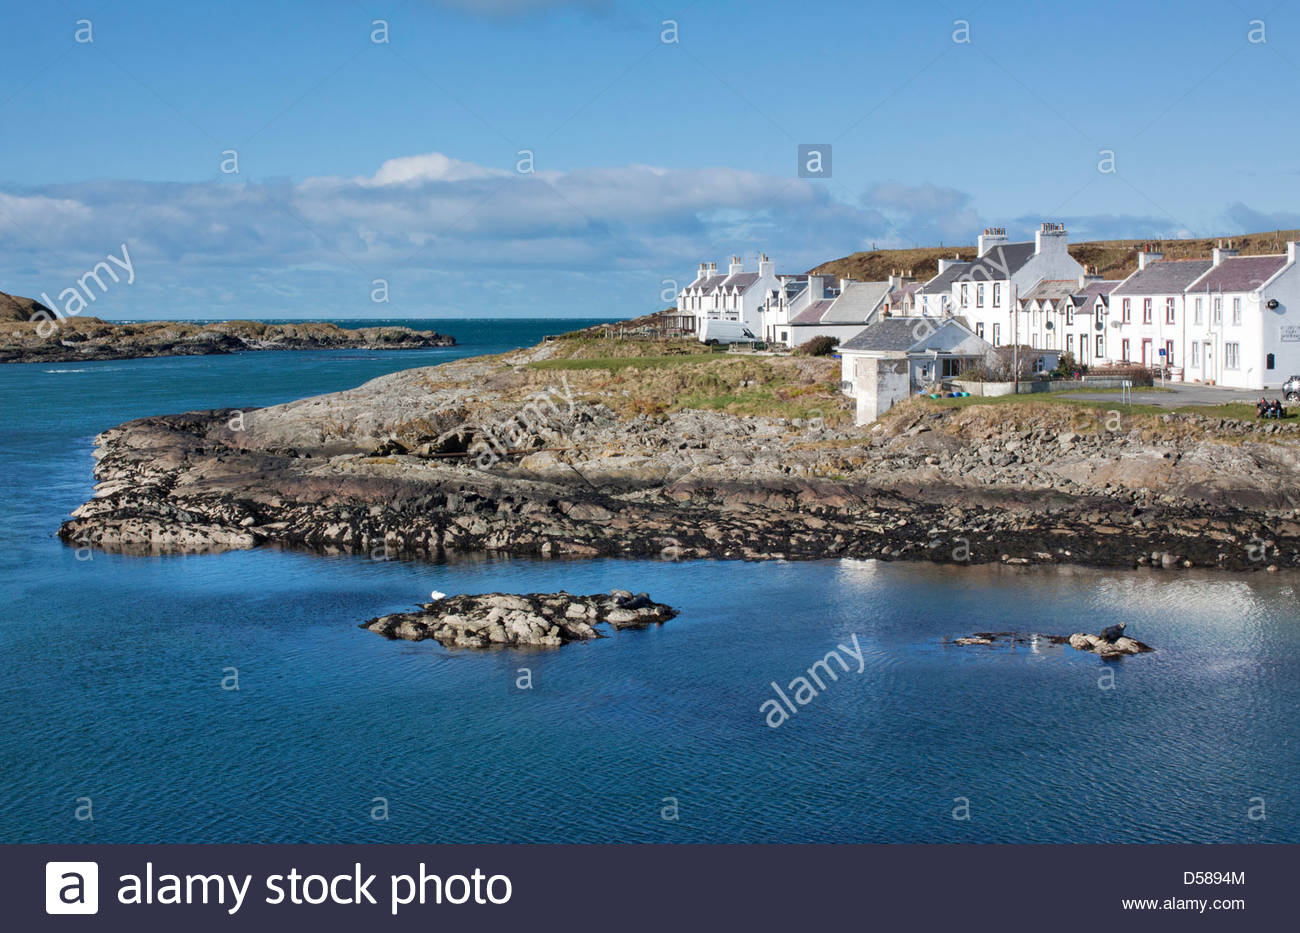 Portnahaven, Islay, An Island of the Inner Hebrides, Scotland - Stock Image